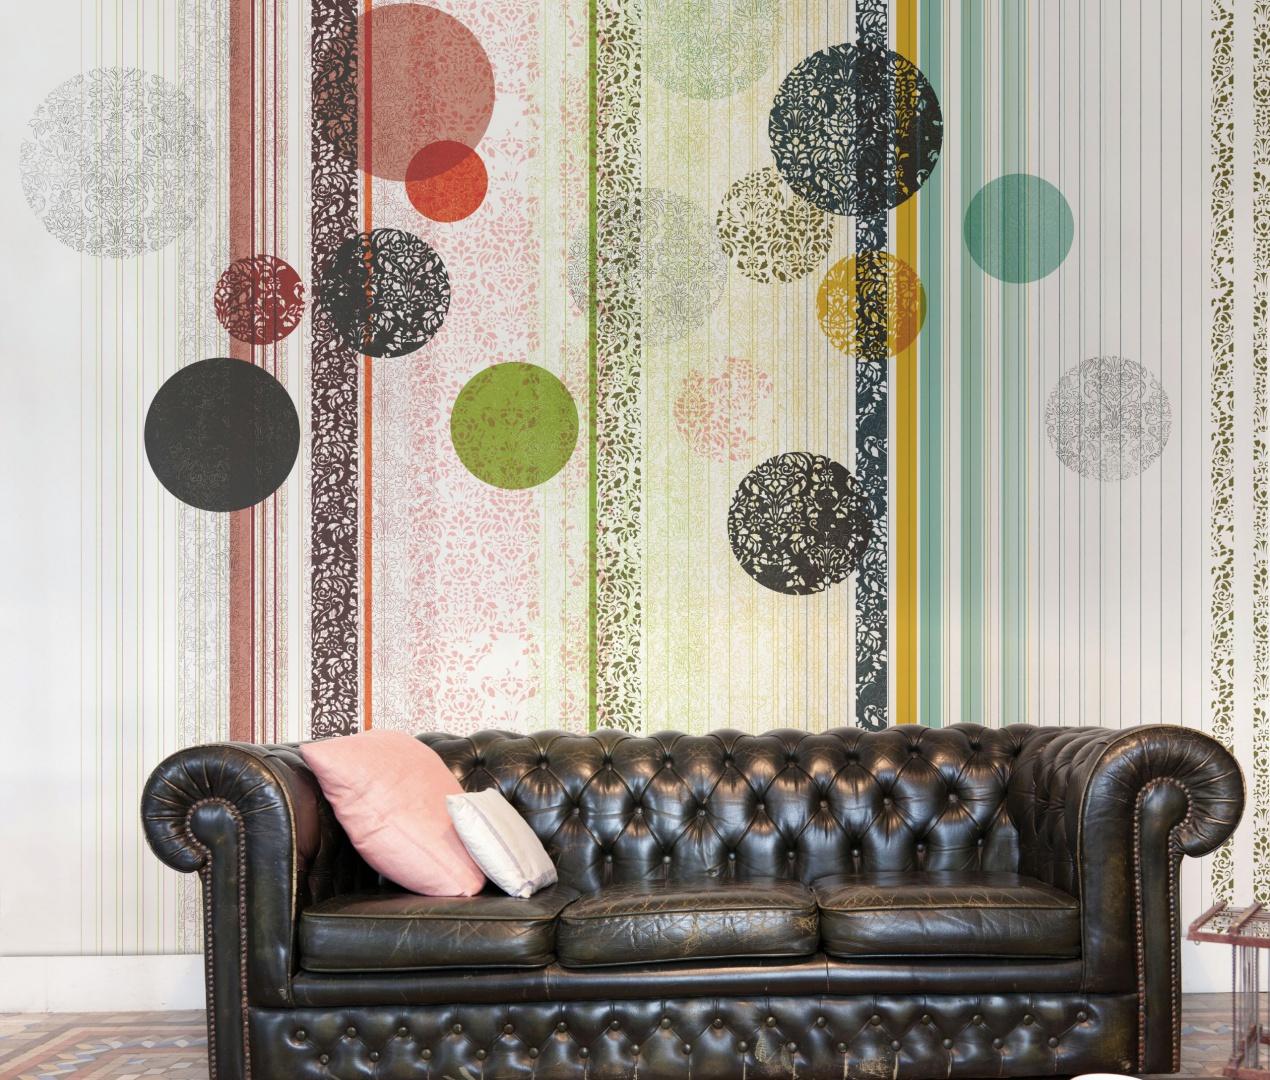 Nowoczesne tapety do salonu modne kolory ciekawe wzory - Catalogos de papel pintado para paredes ...